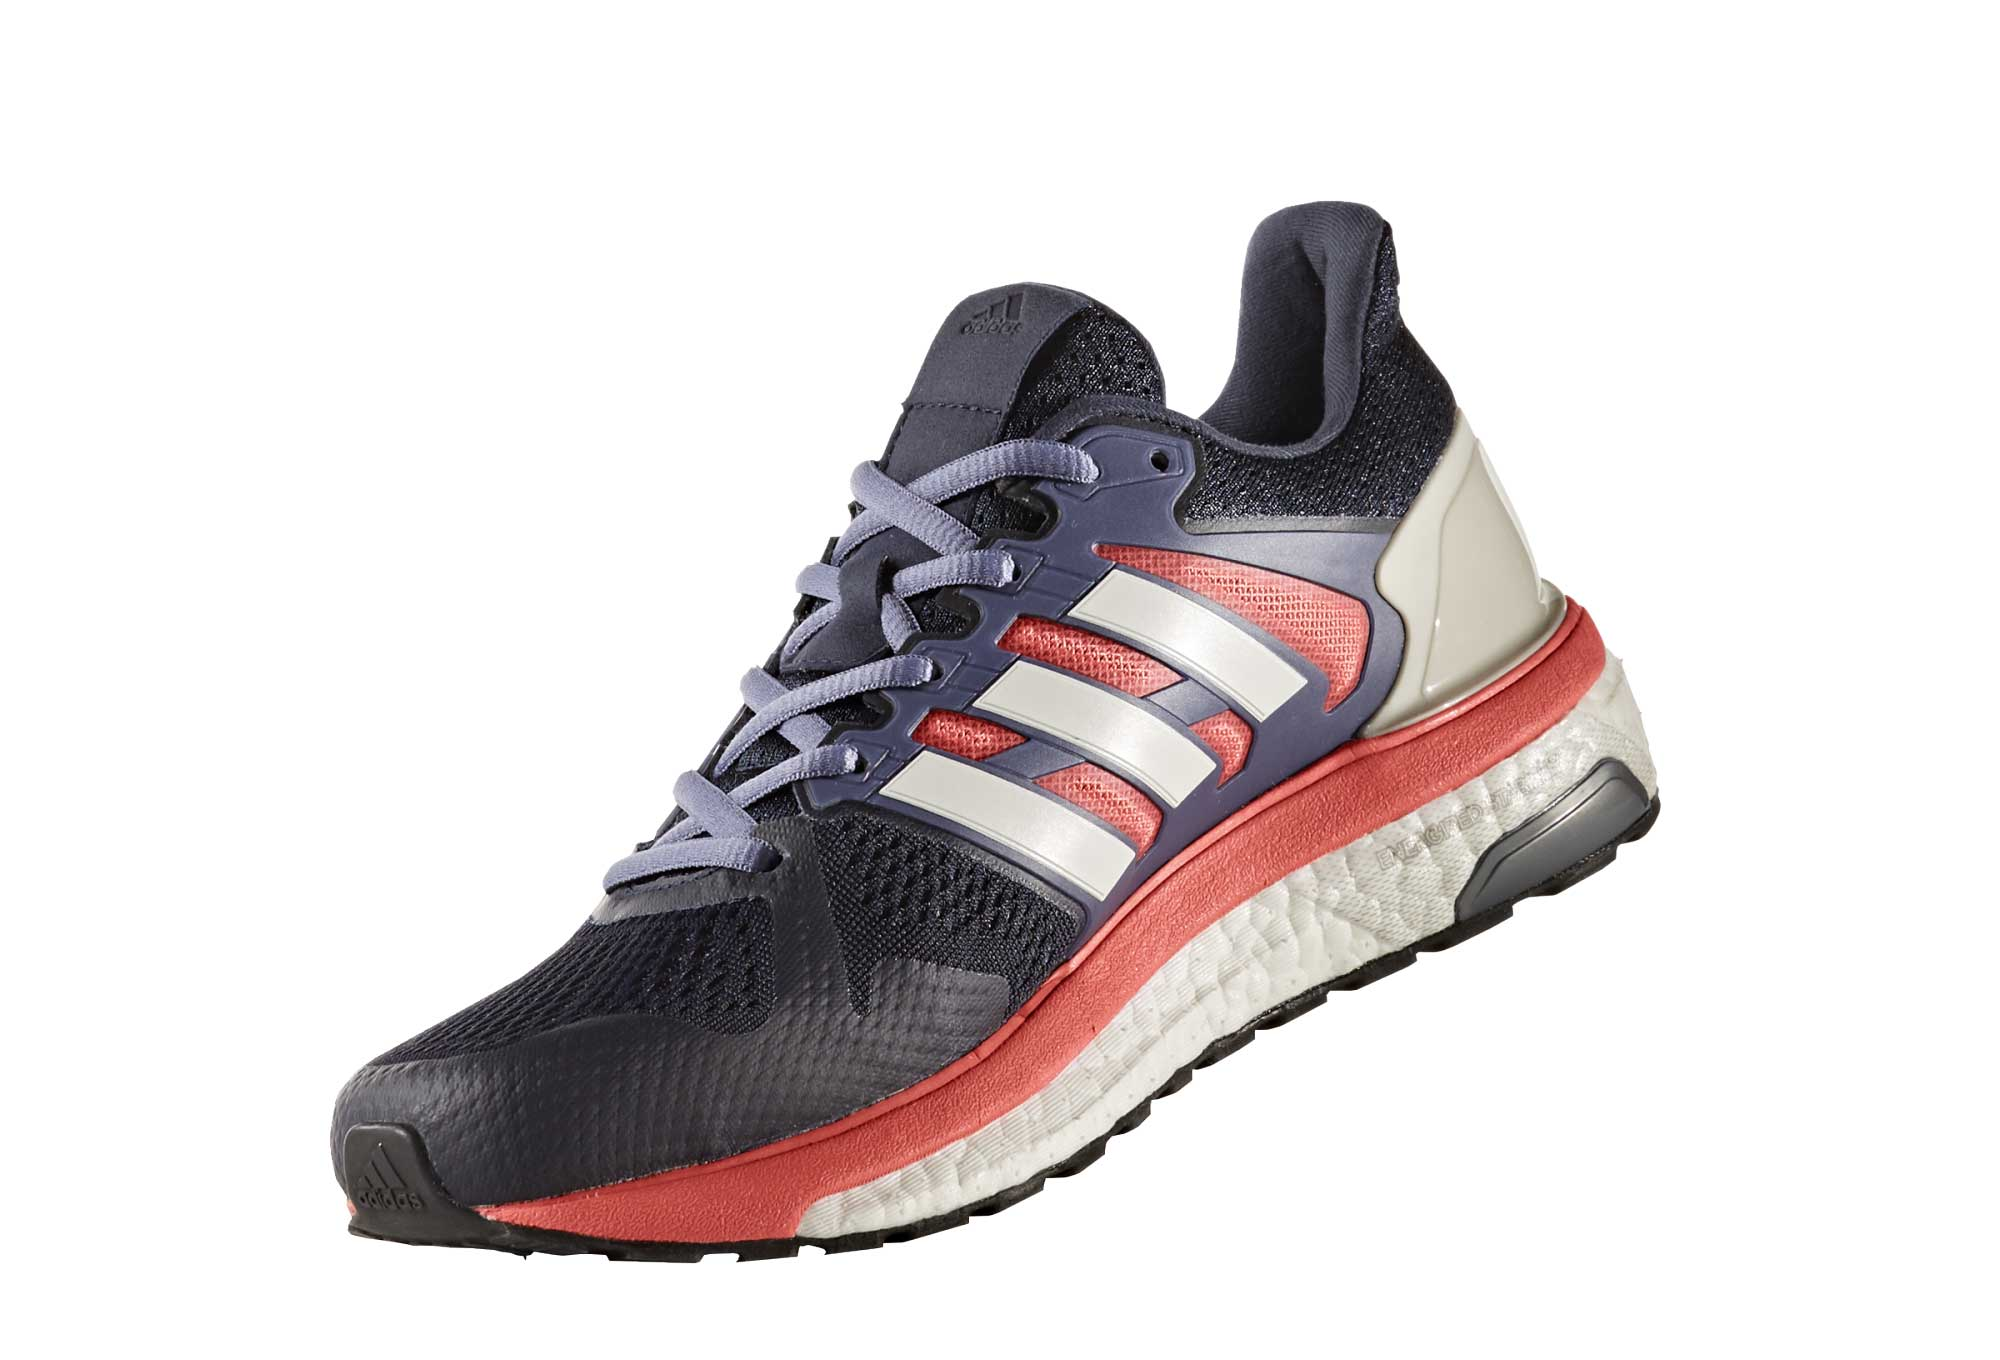 Adidas Violet Rose Femme Supernova St Bleu Running uFJ5TlK1c3